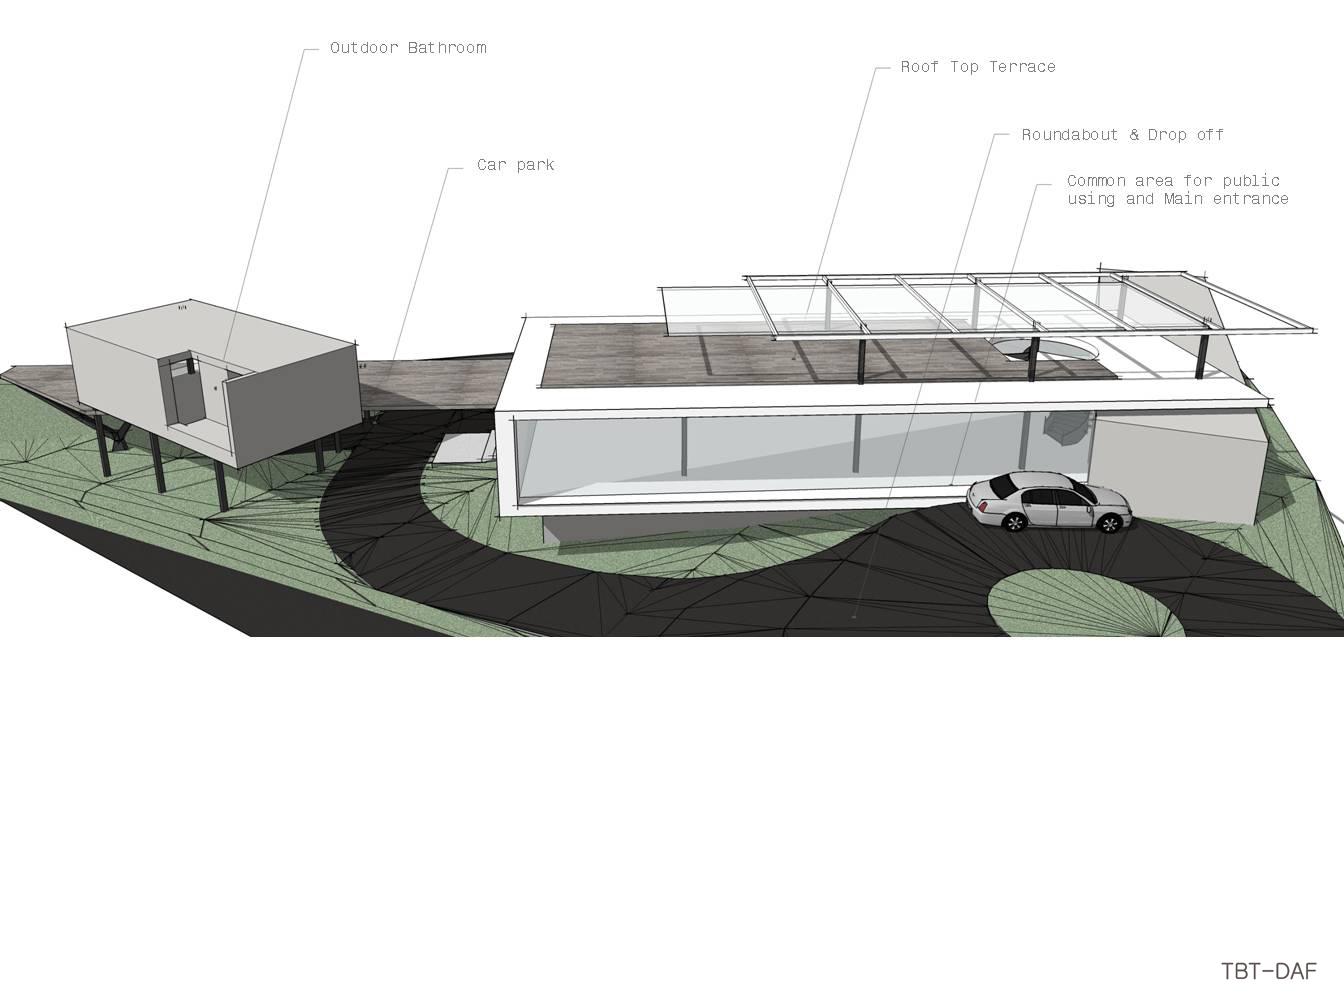 TBT-DAF interior design house khoyai thailand phupattra 7